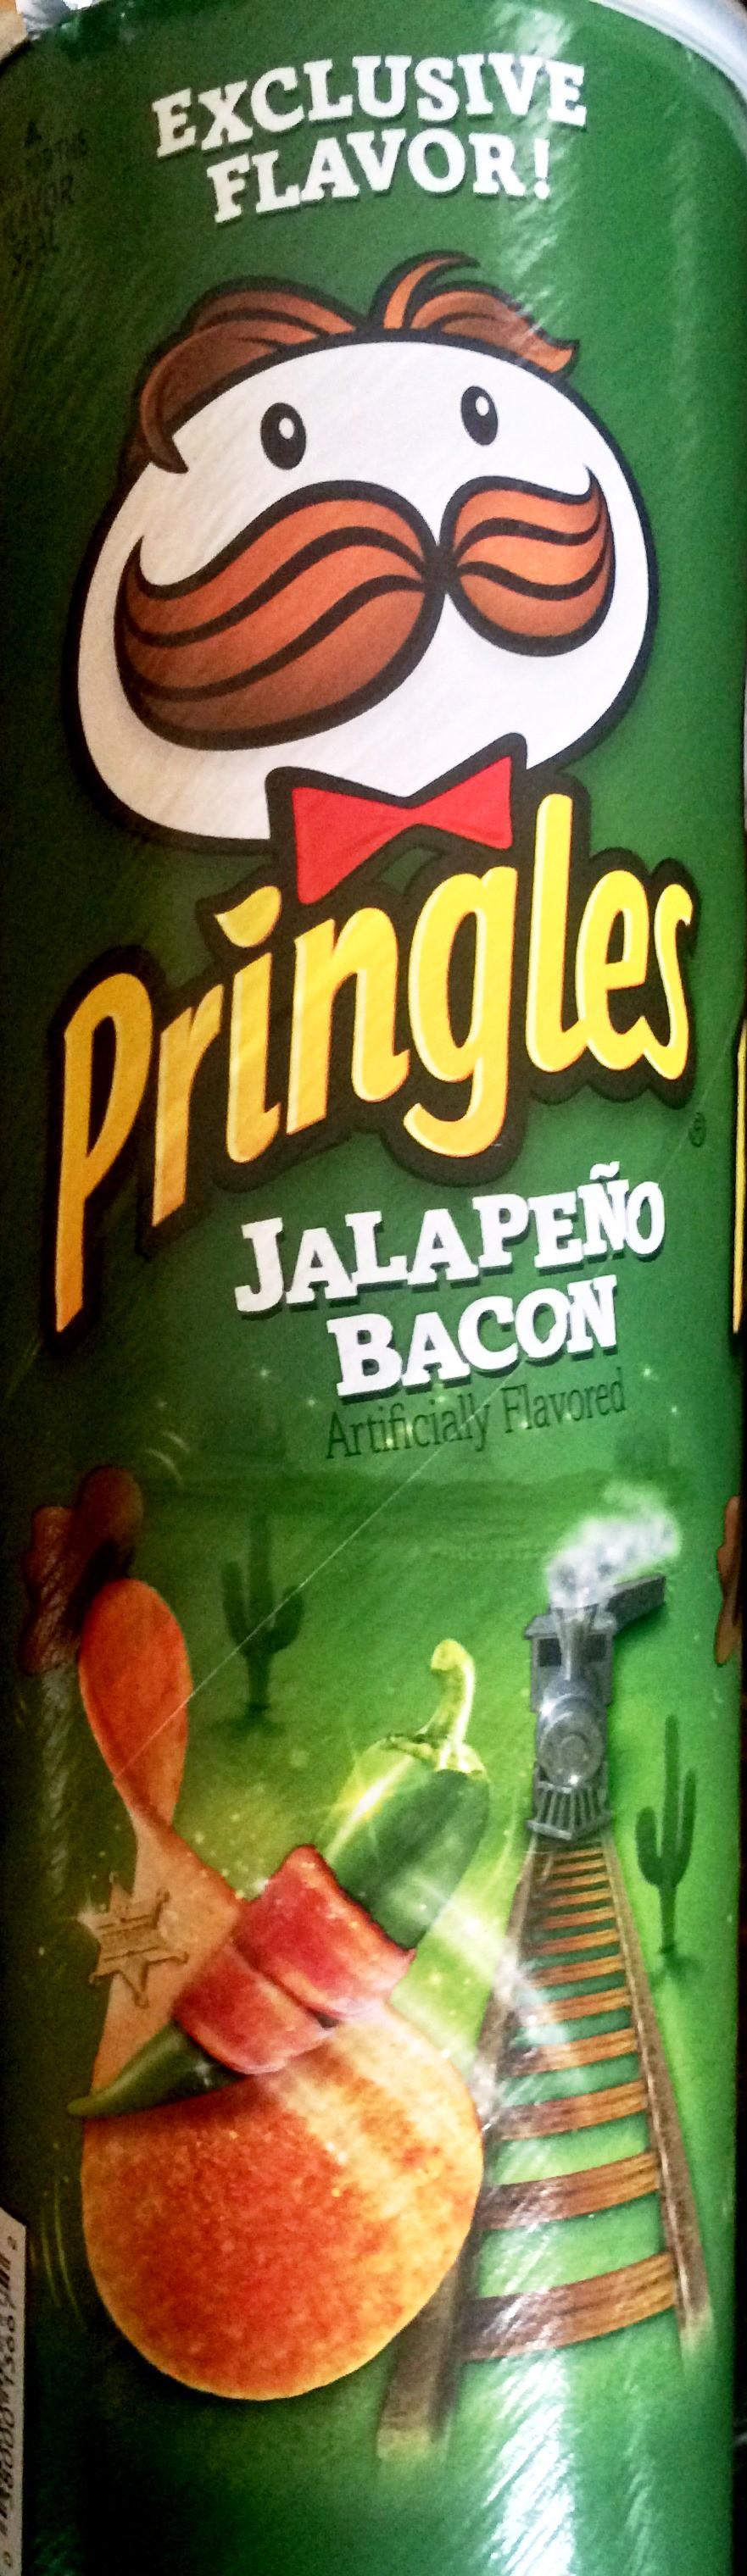 review pringles exclusive flavor jalapeno bacon